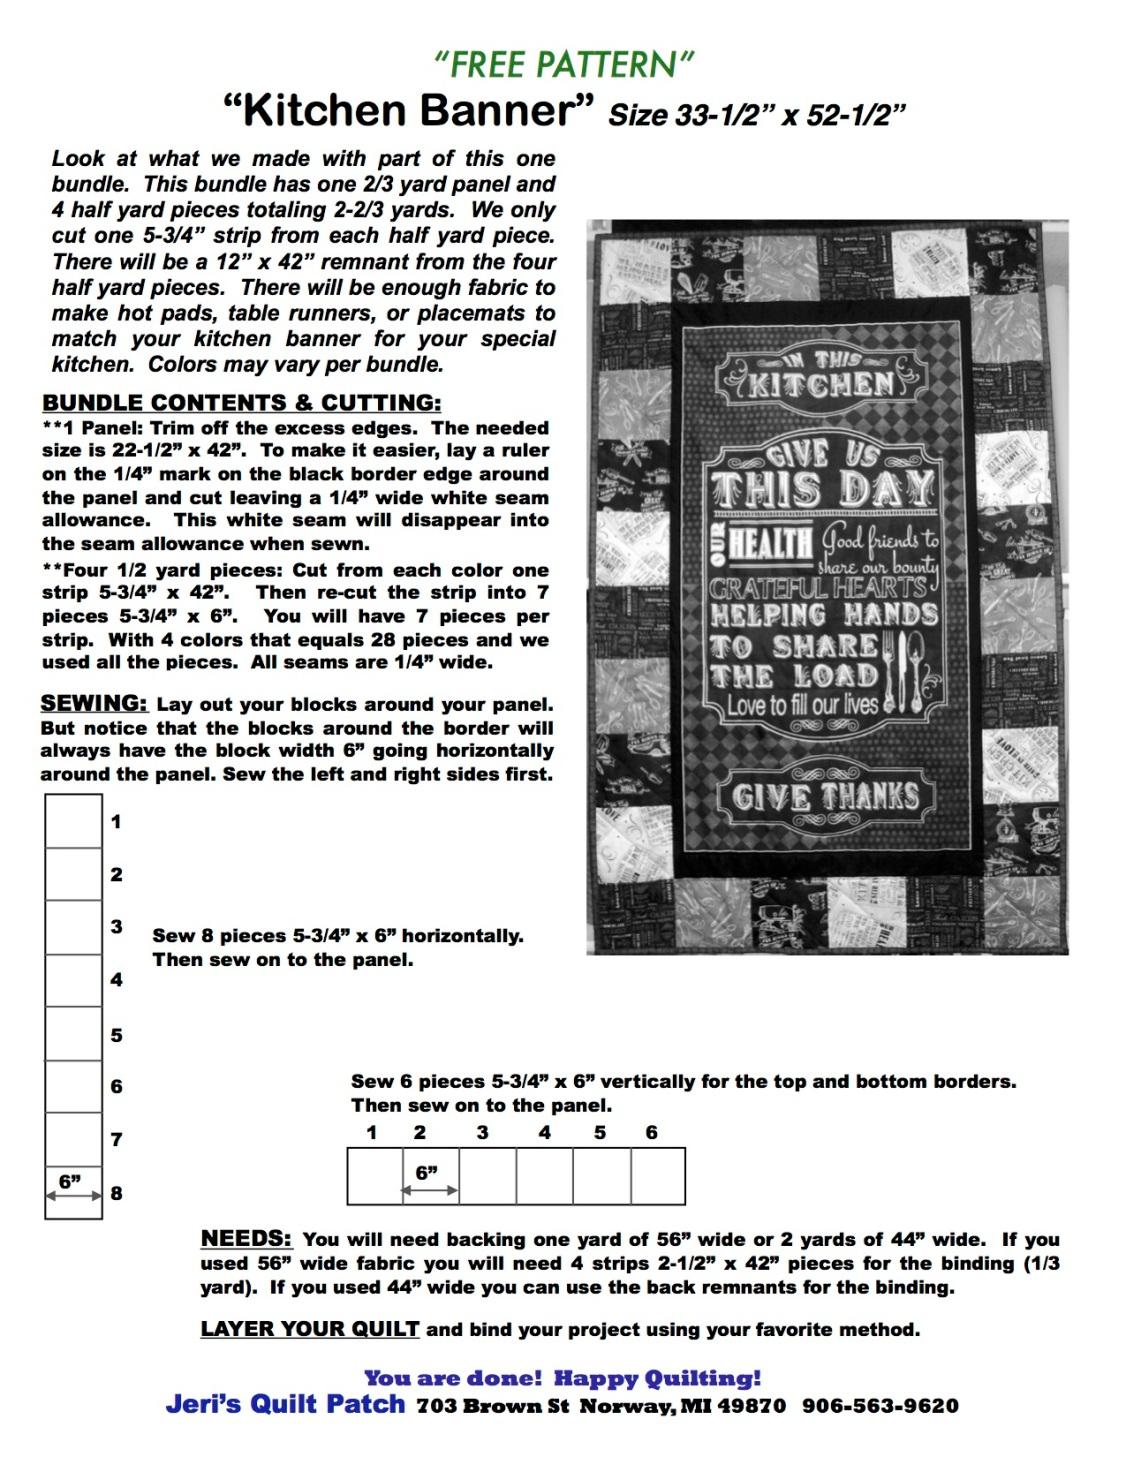 Kitchen Banner Free copy